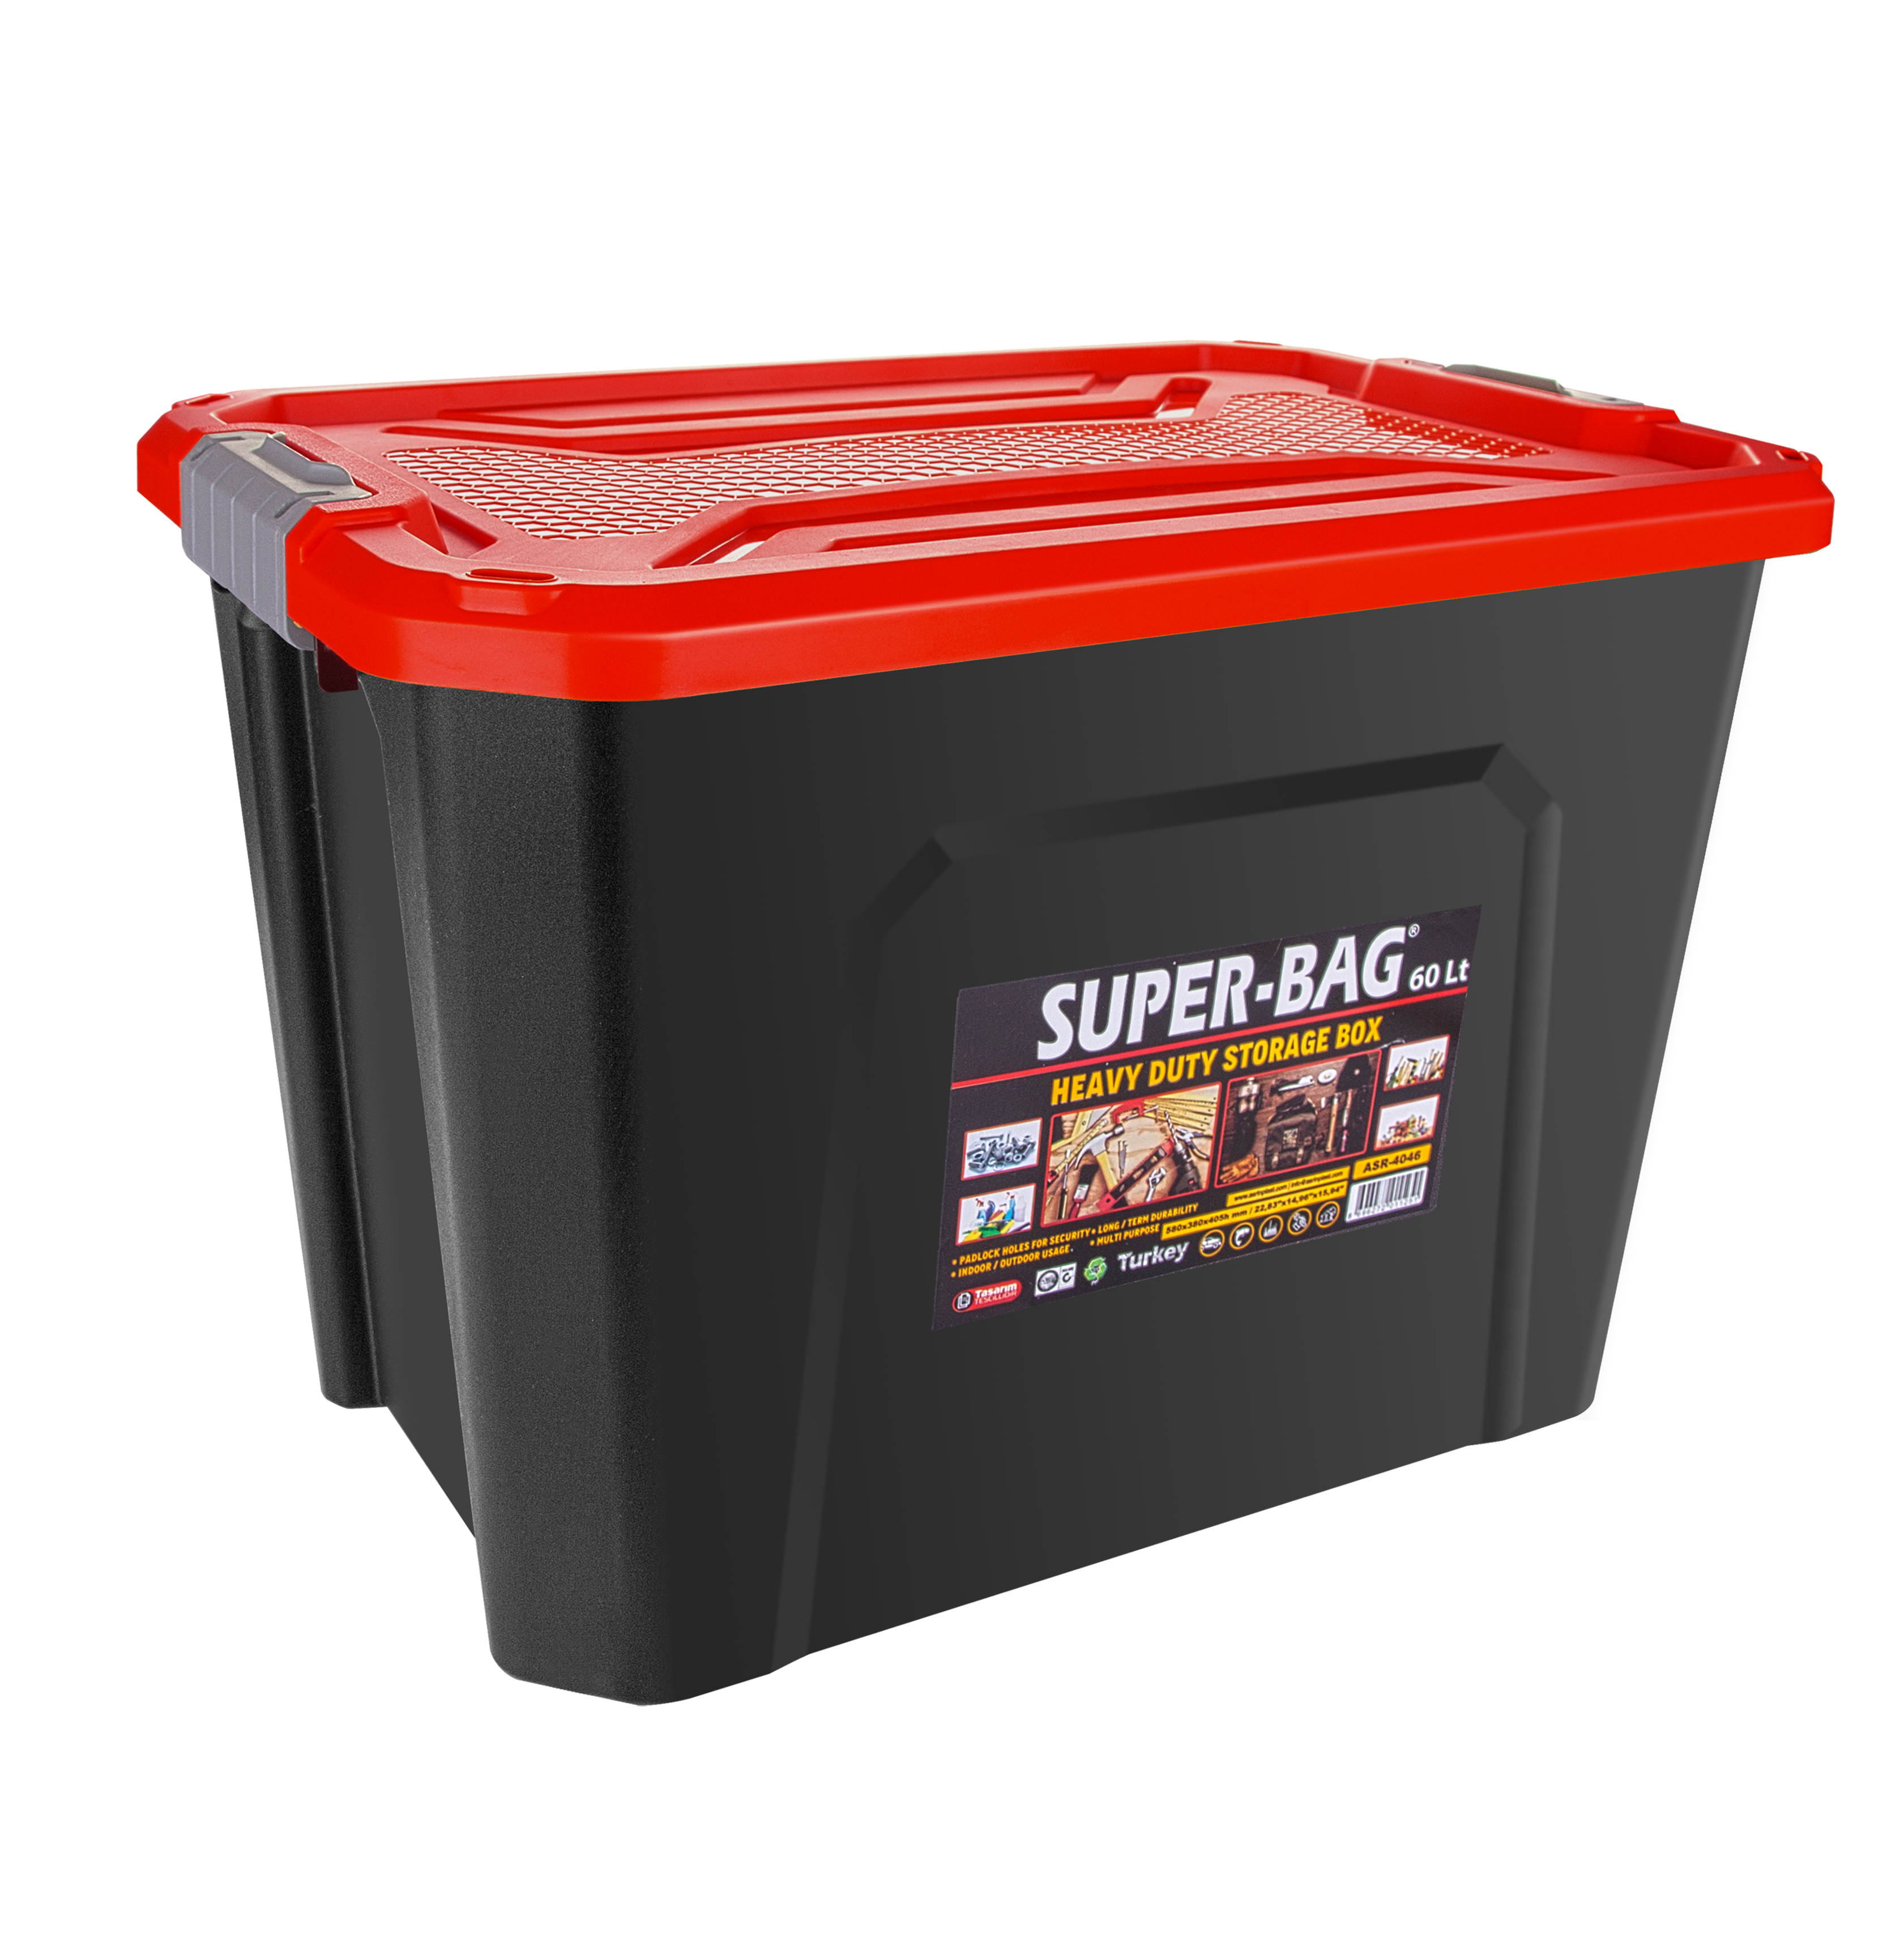 ASR-4046 Superbag Saklama Kutusu Renkli Kapak 60 LT